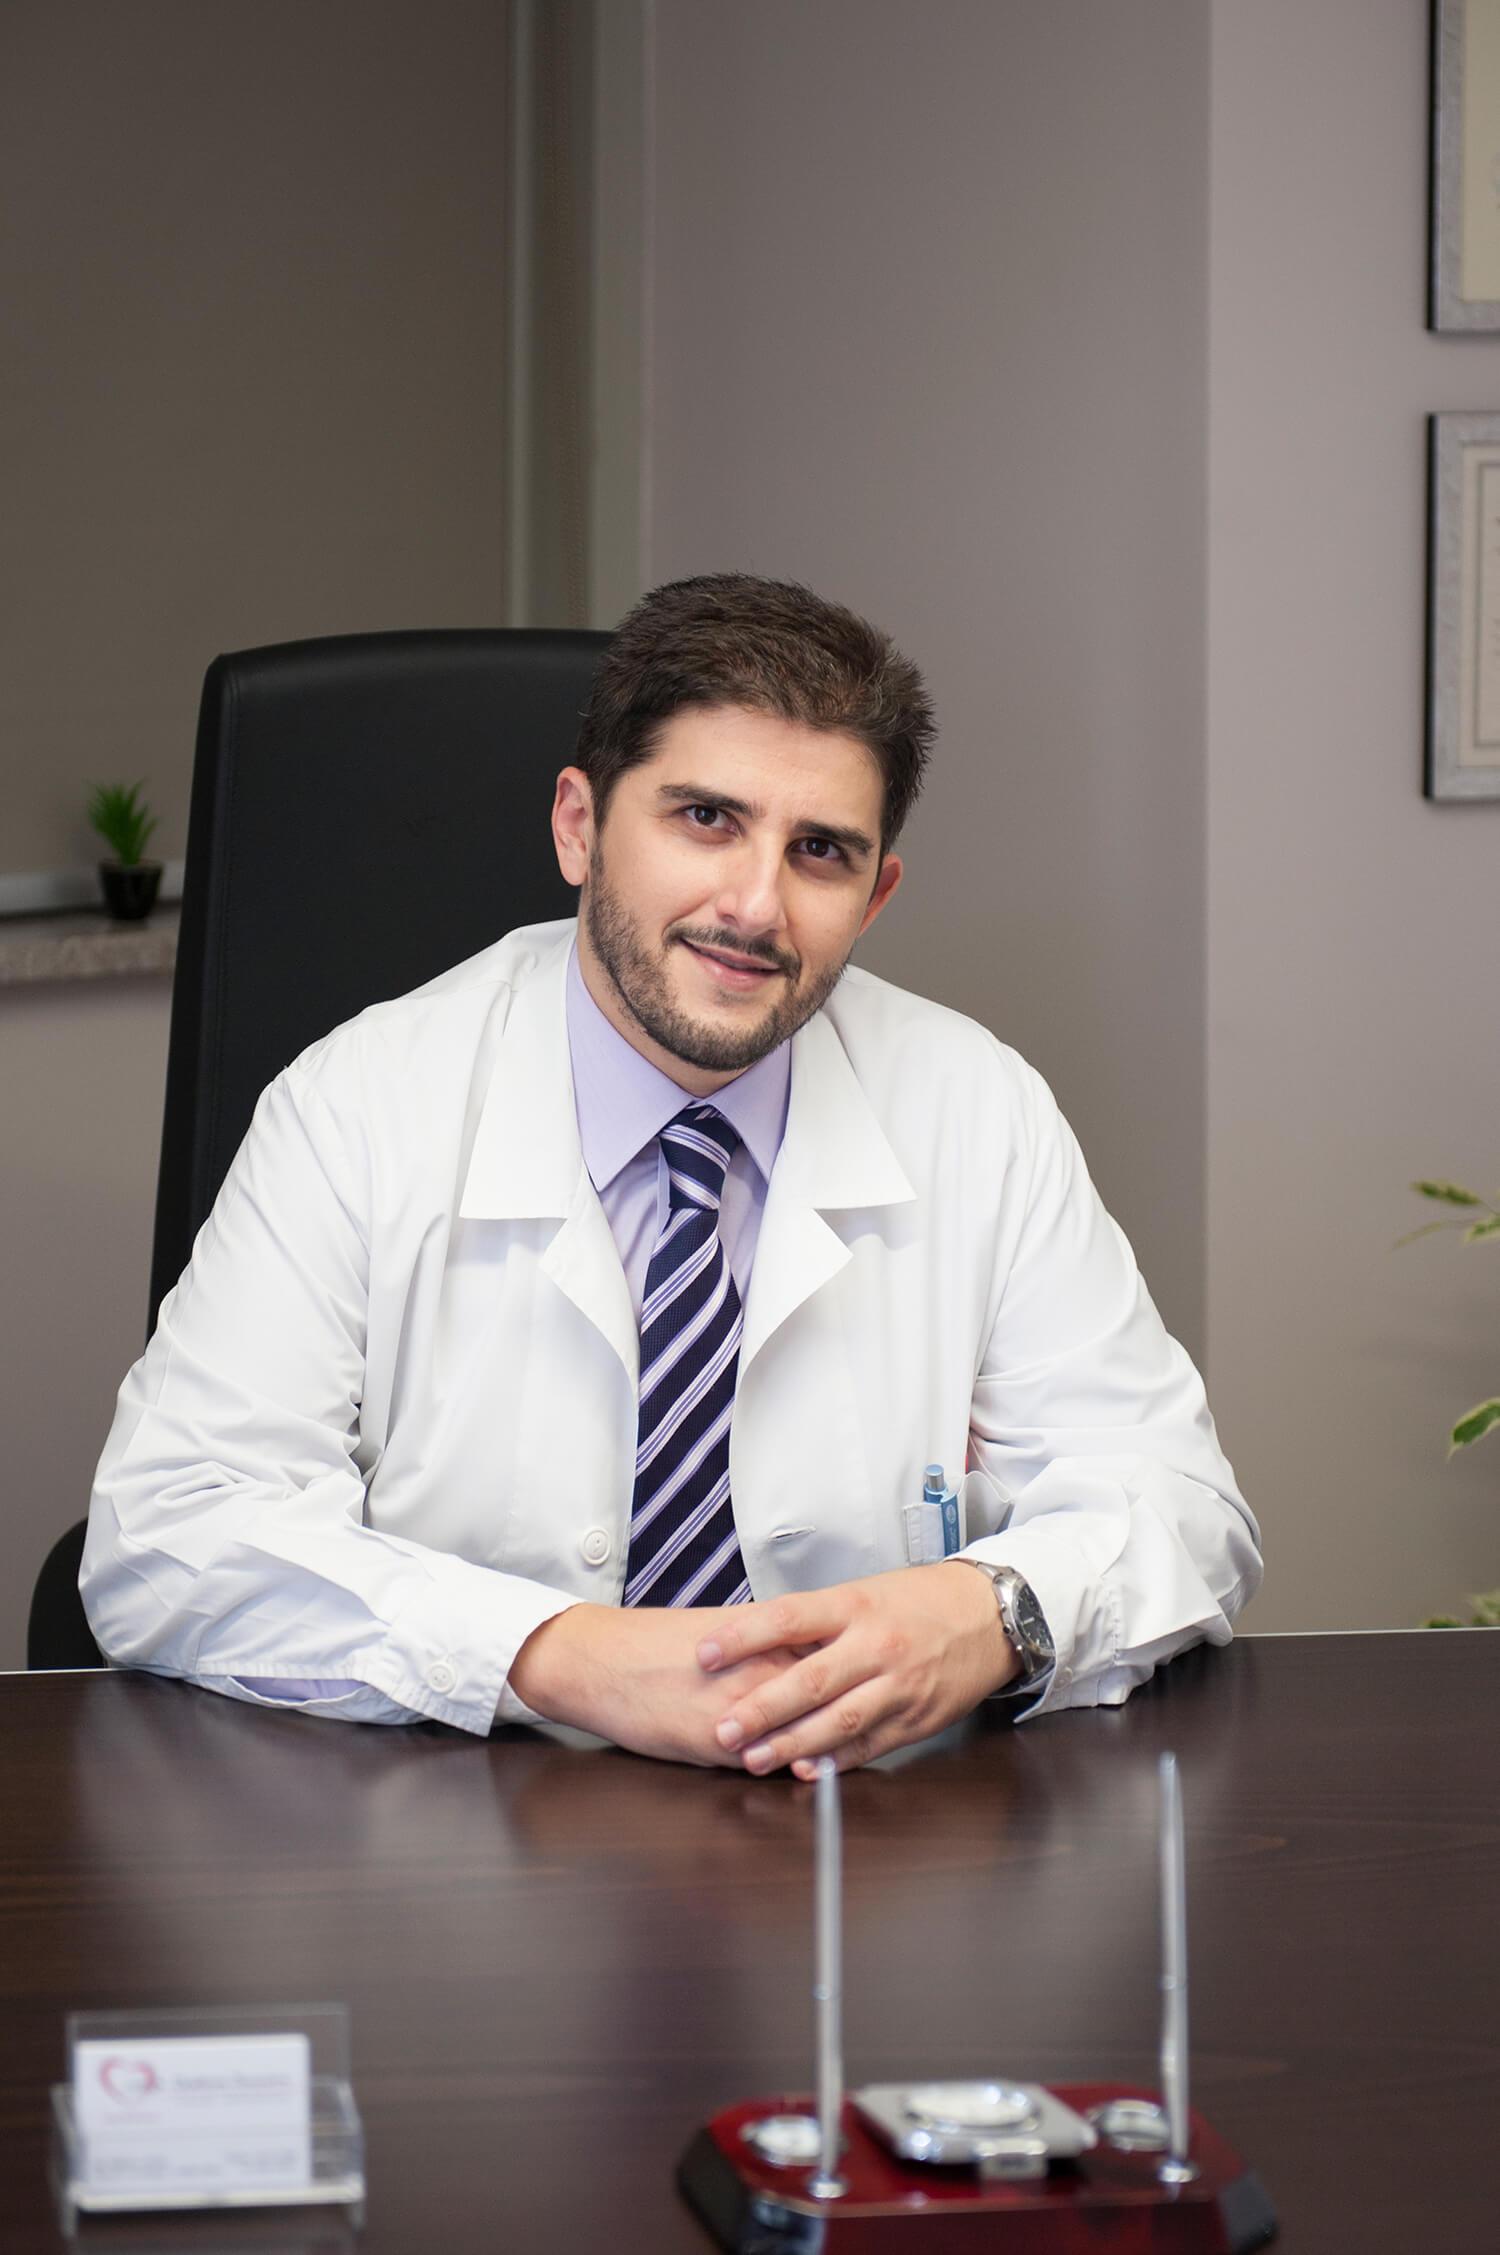 photo doctor